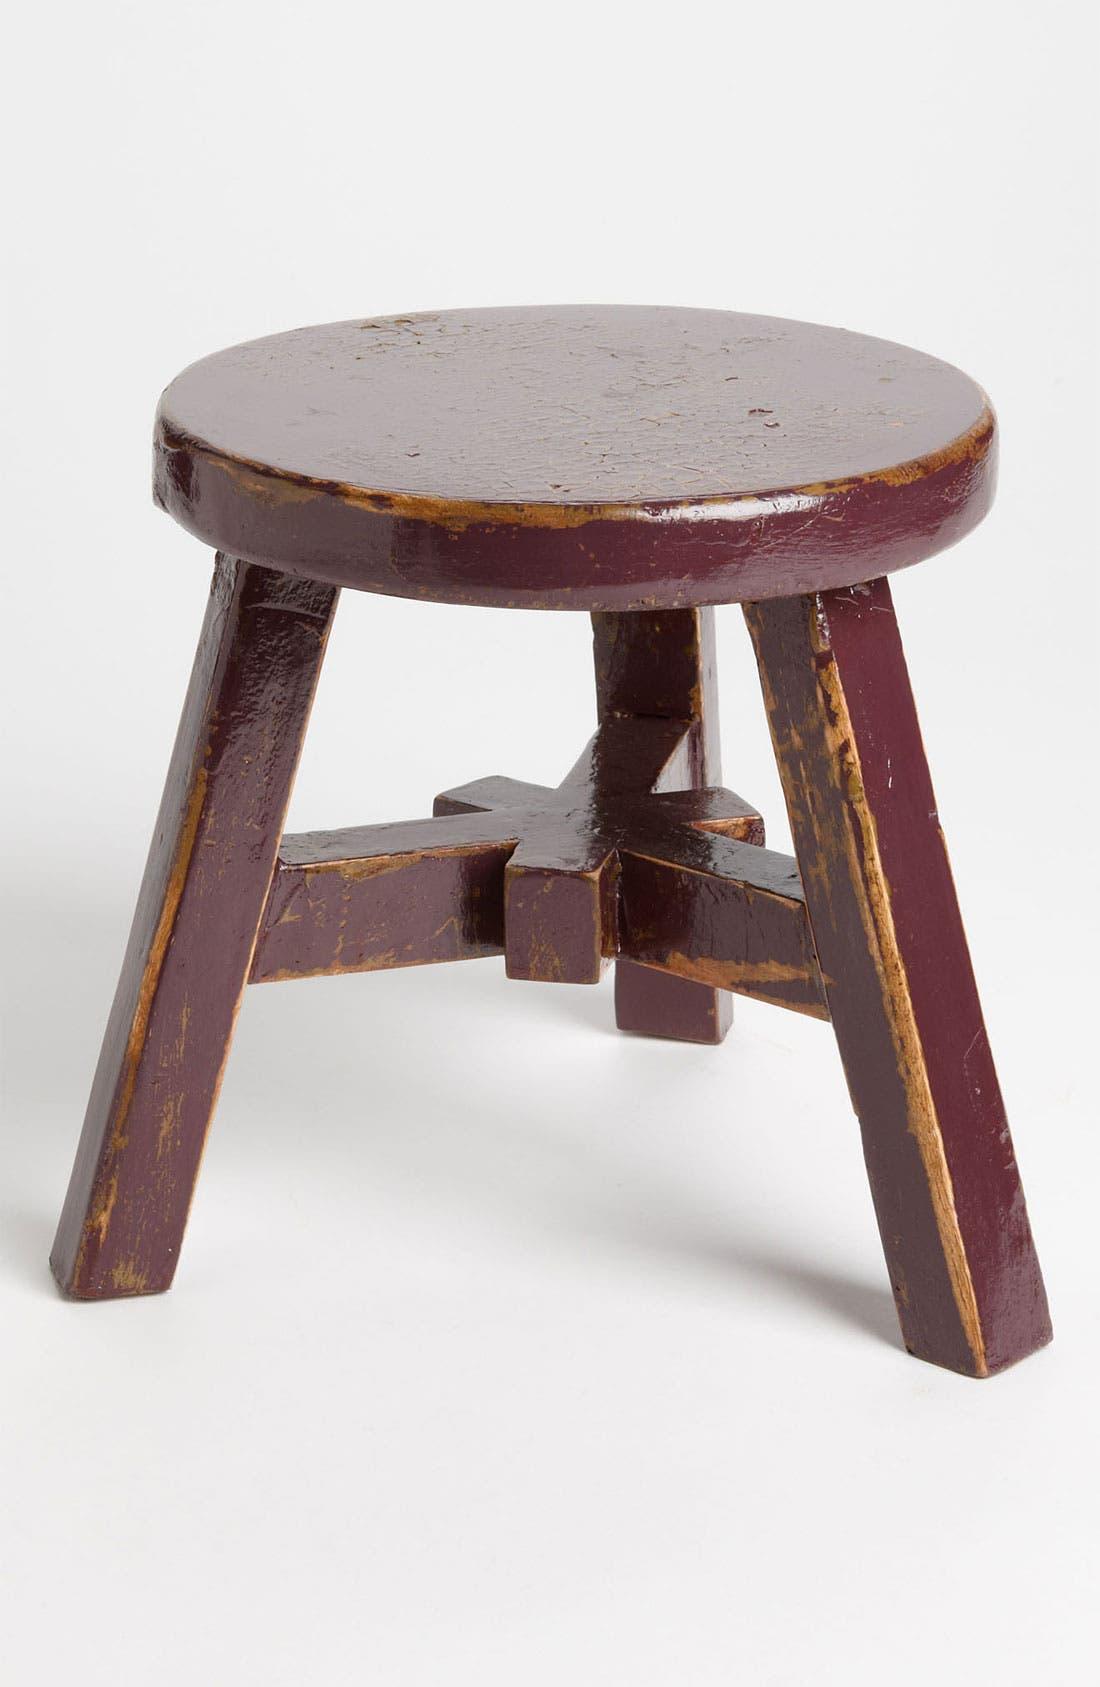 Main Image - Small Decorative Wood Stool